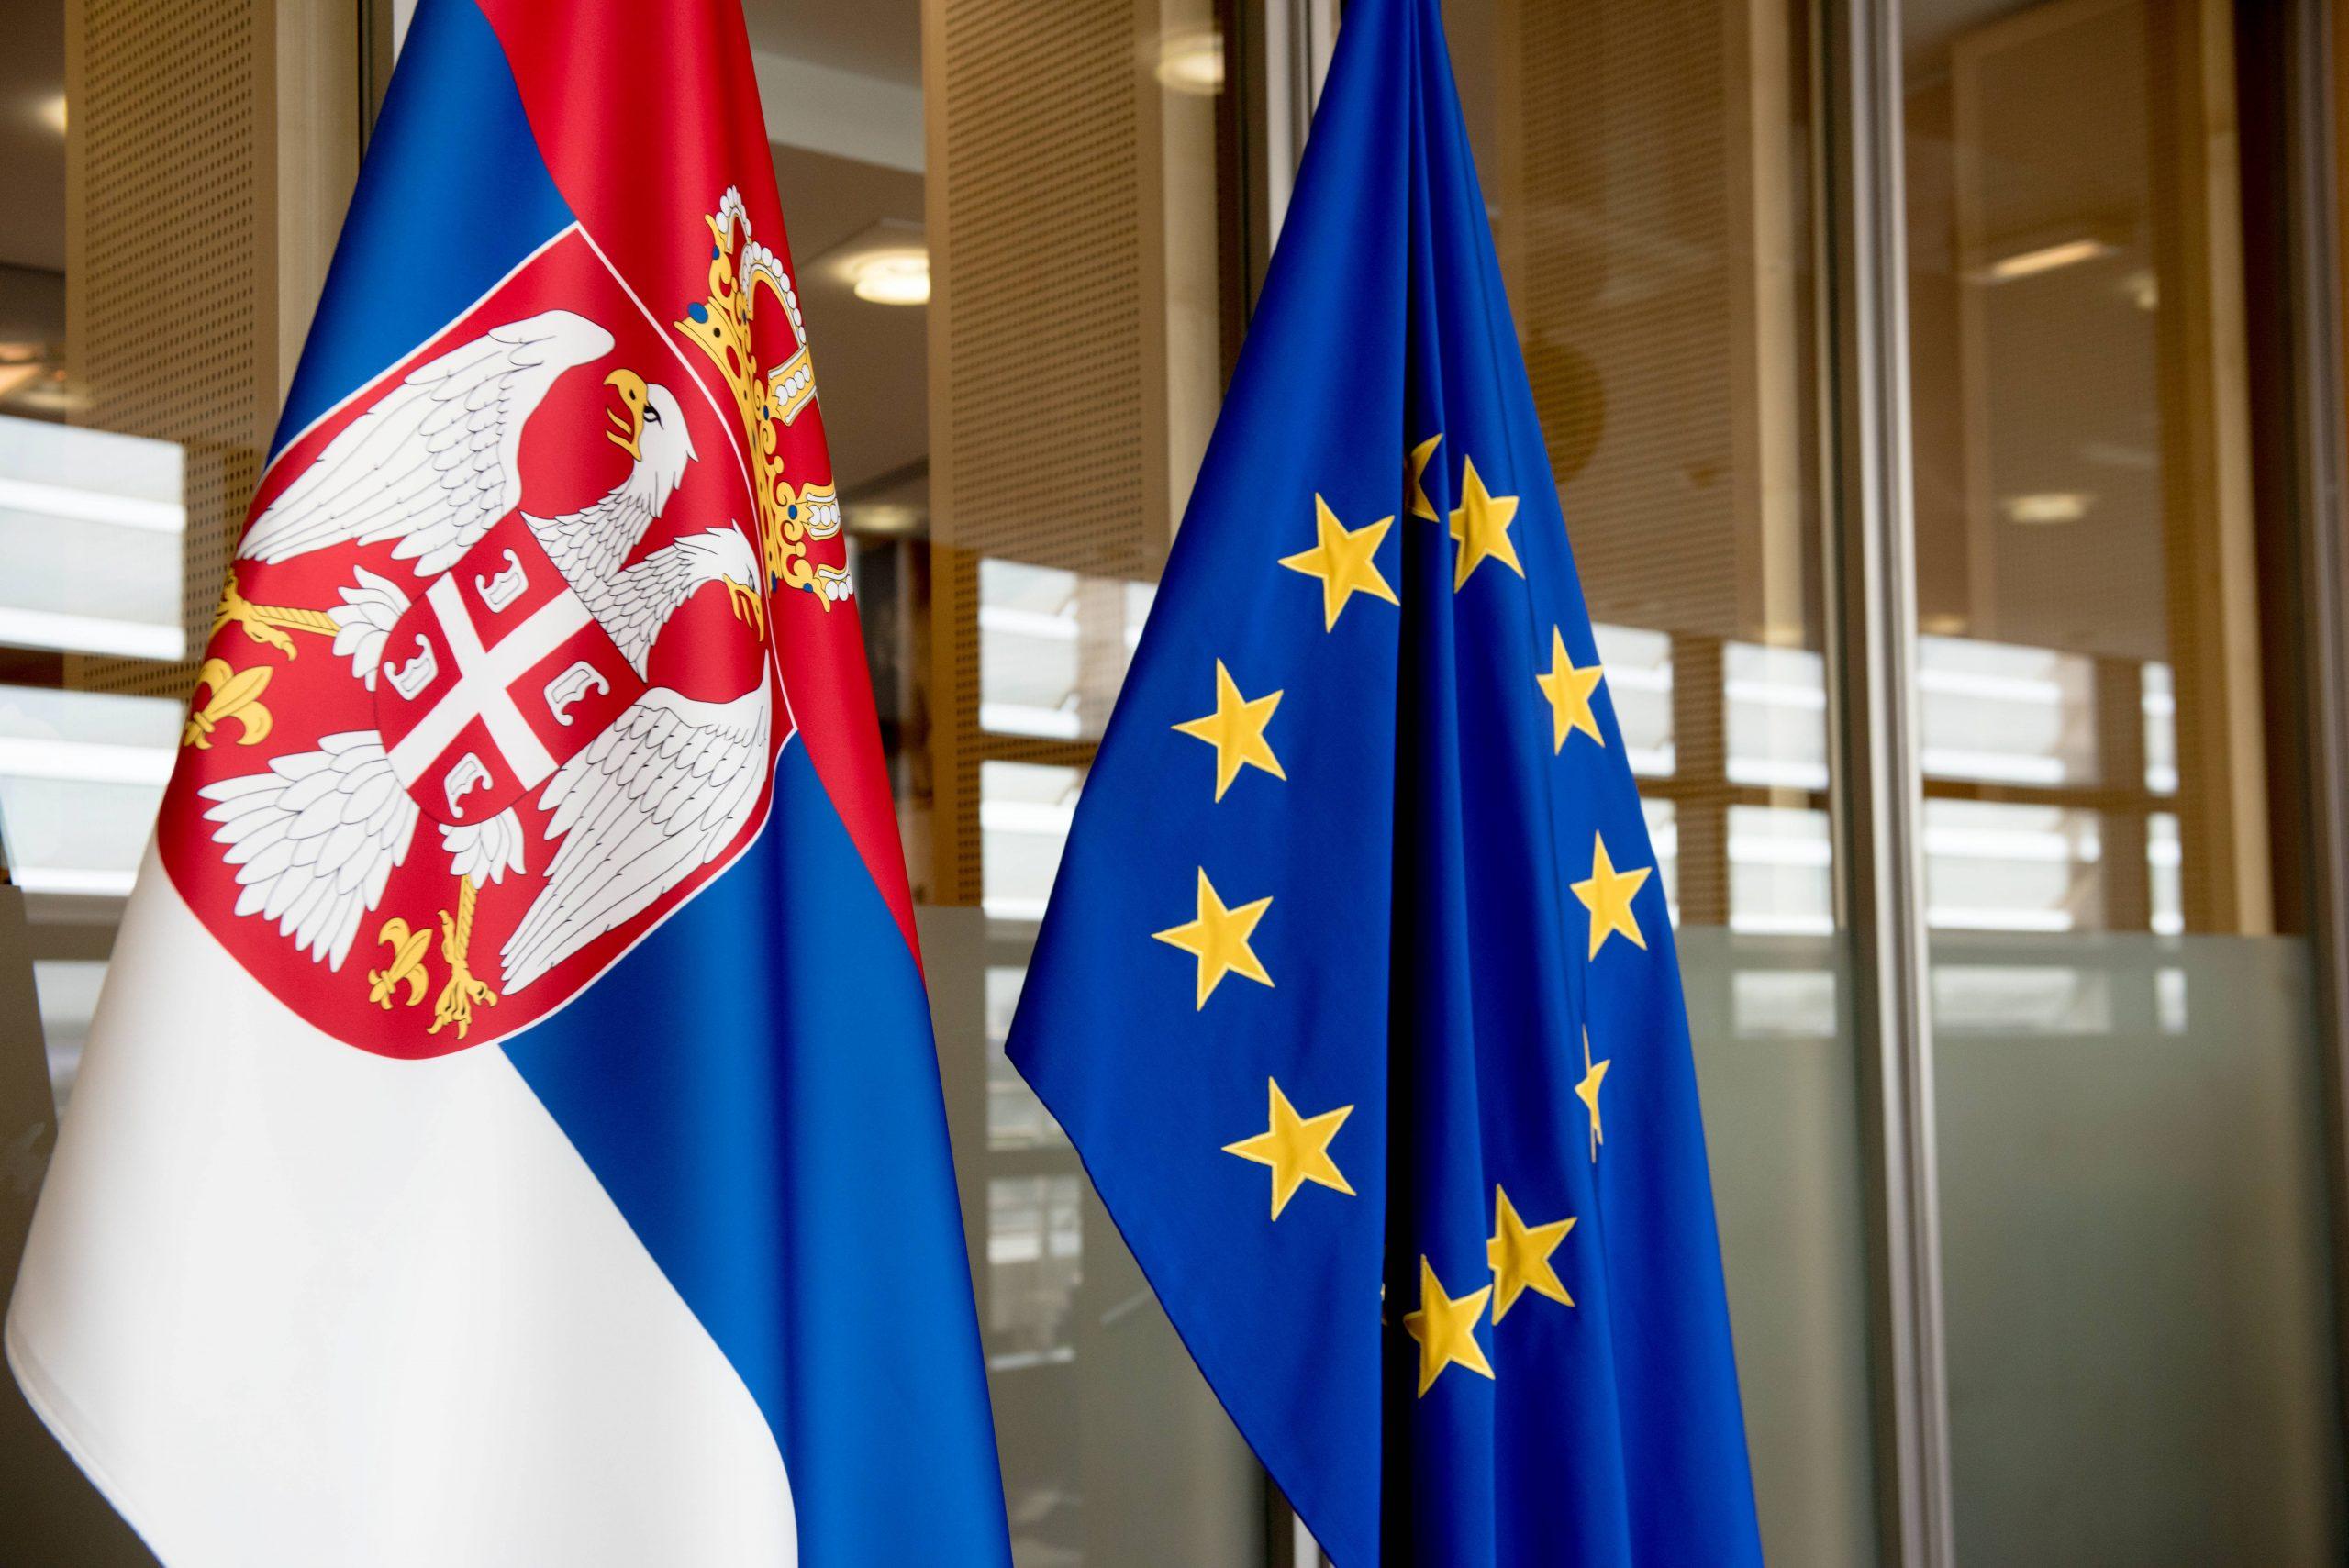 Delegacija EU u Srbiji: Neopravdane istrage ne bi trebalo da se sprovode 1